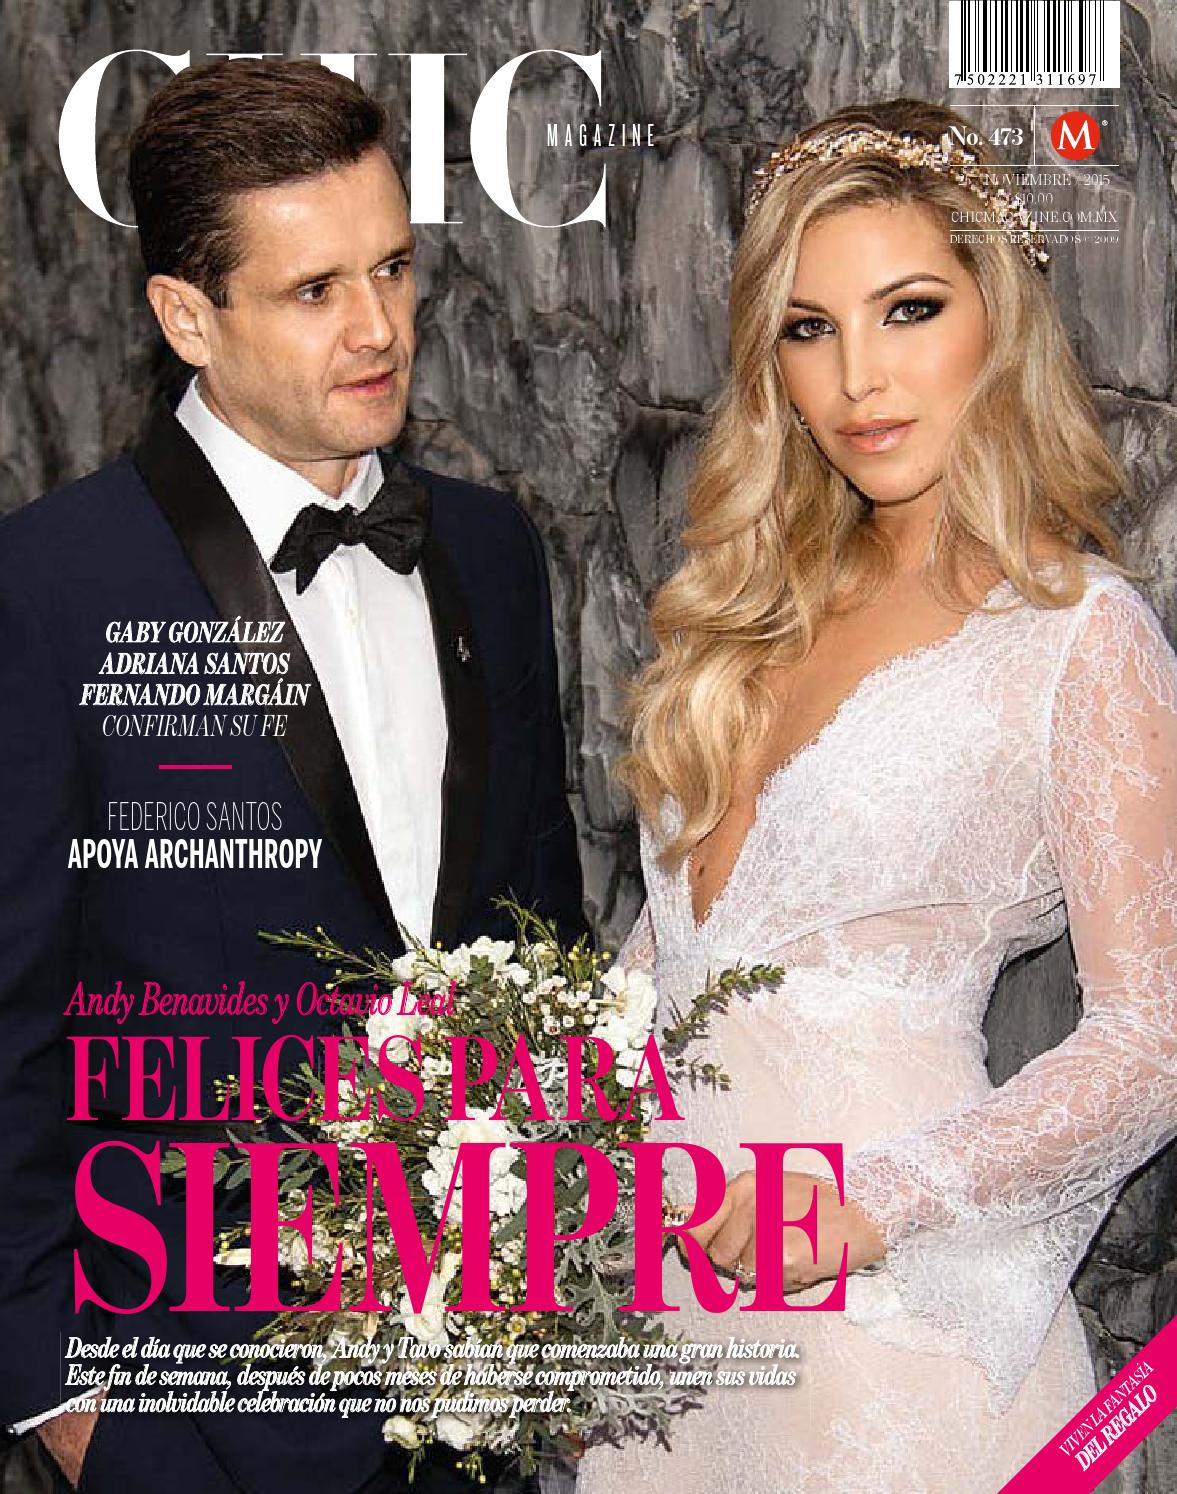 chic magazine monterrey n250m 473 26nov2015 by chic